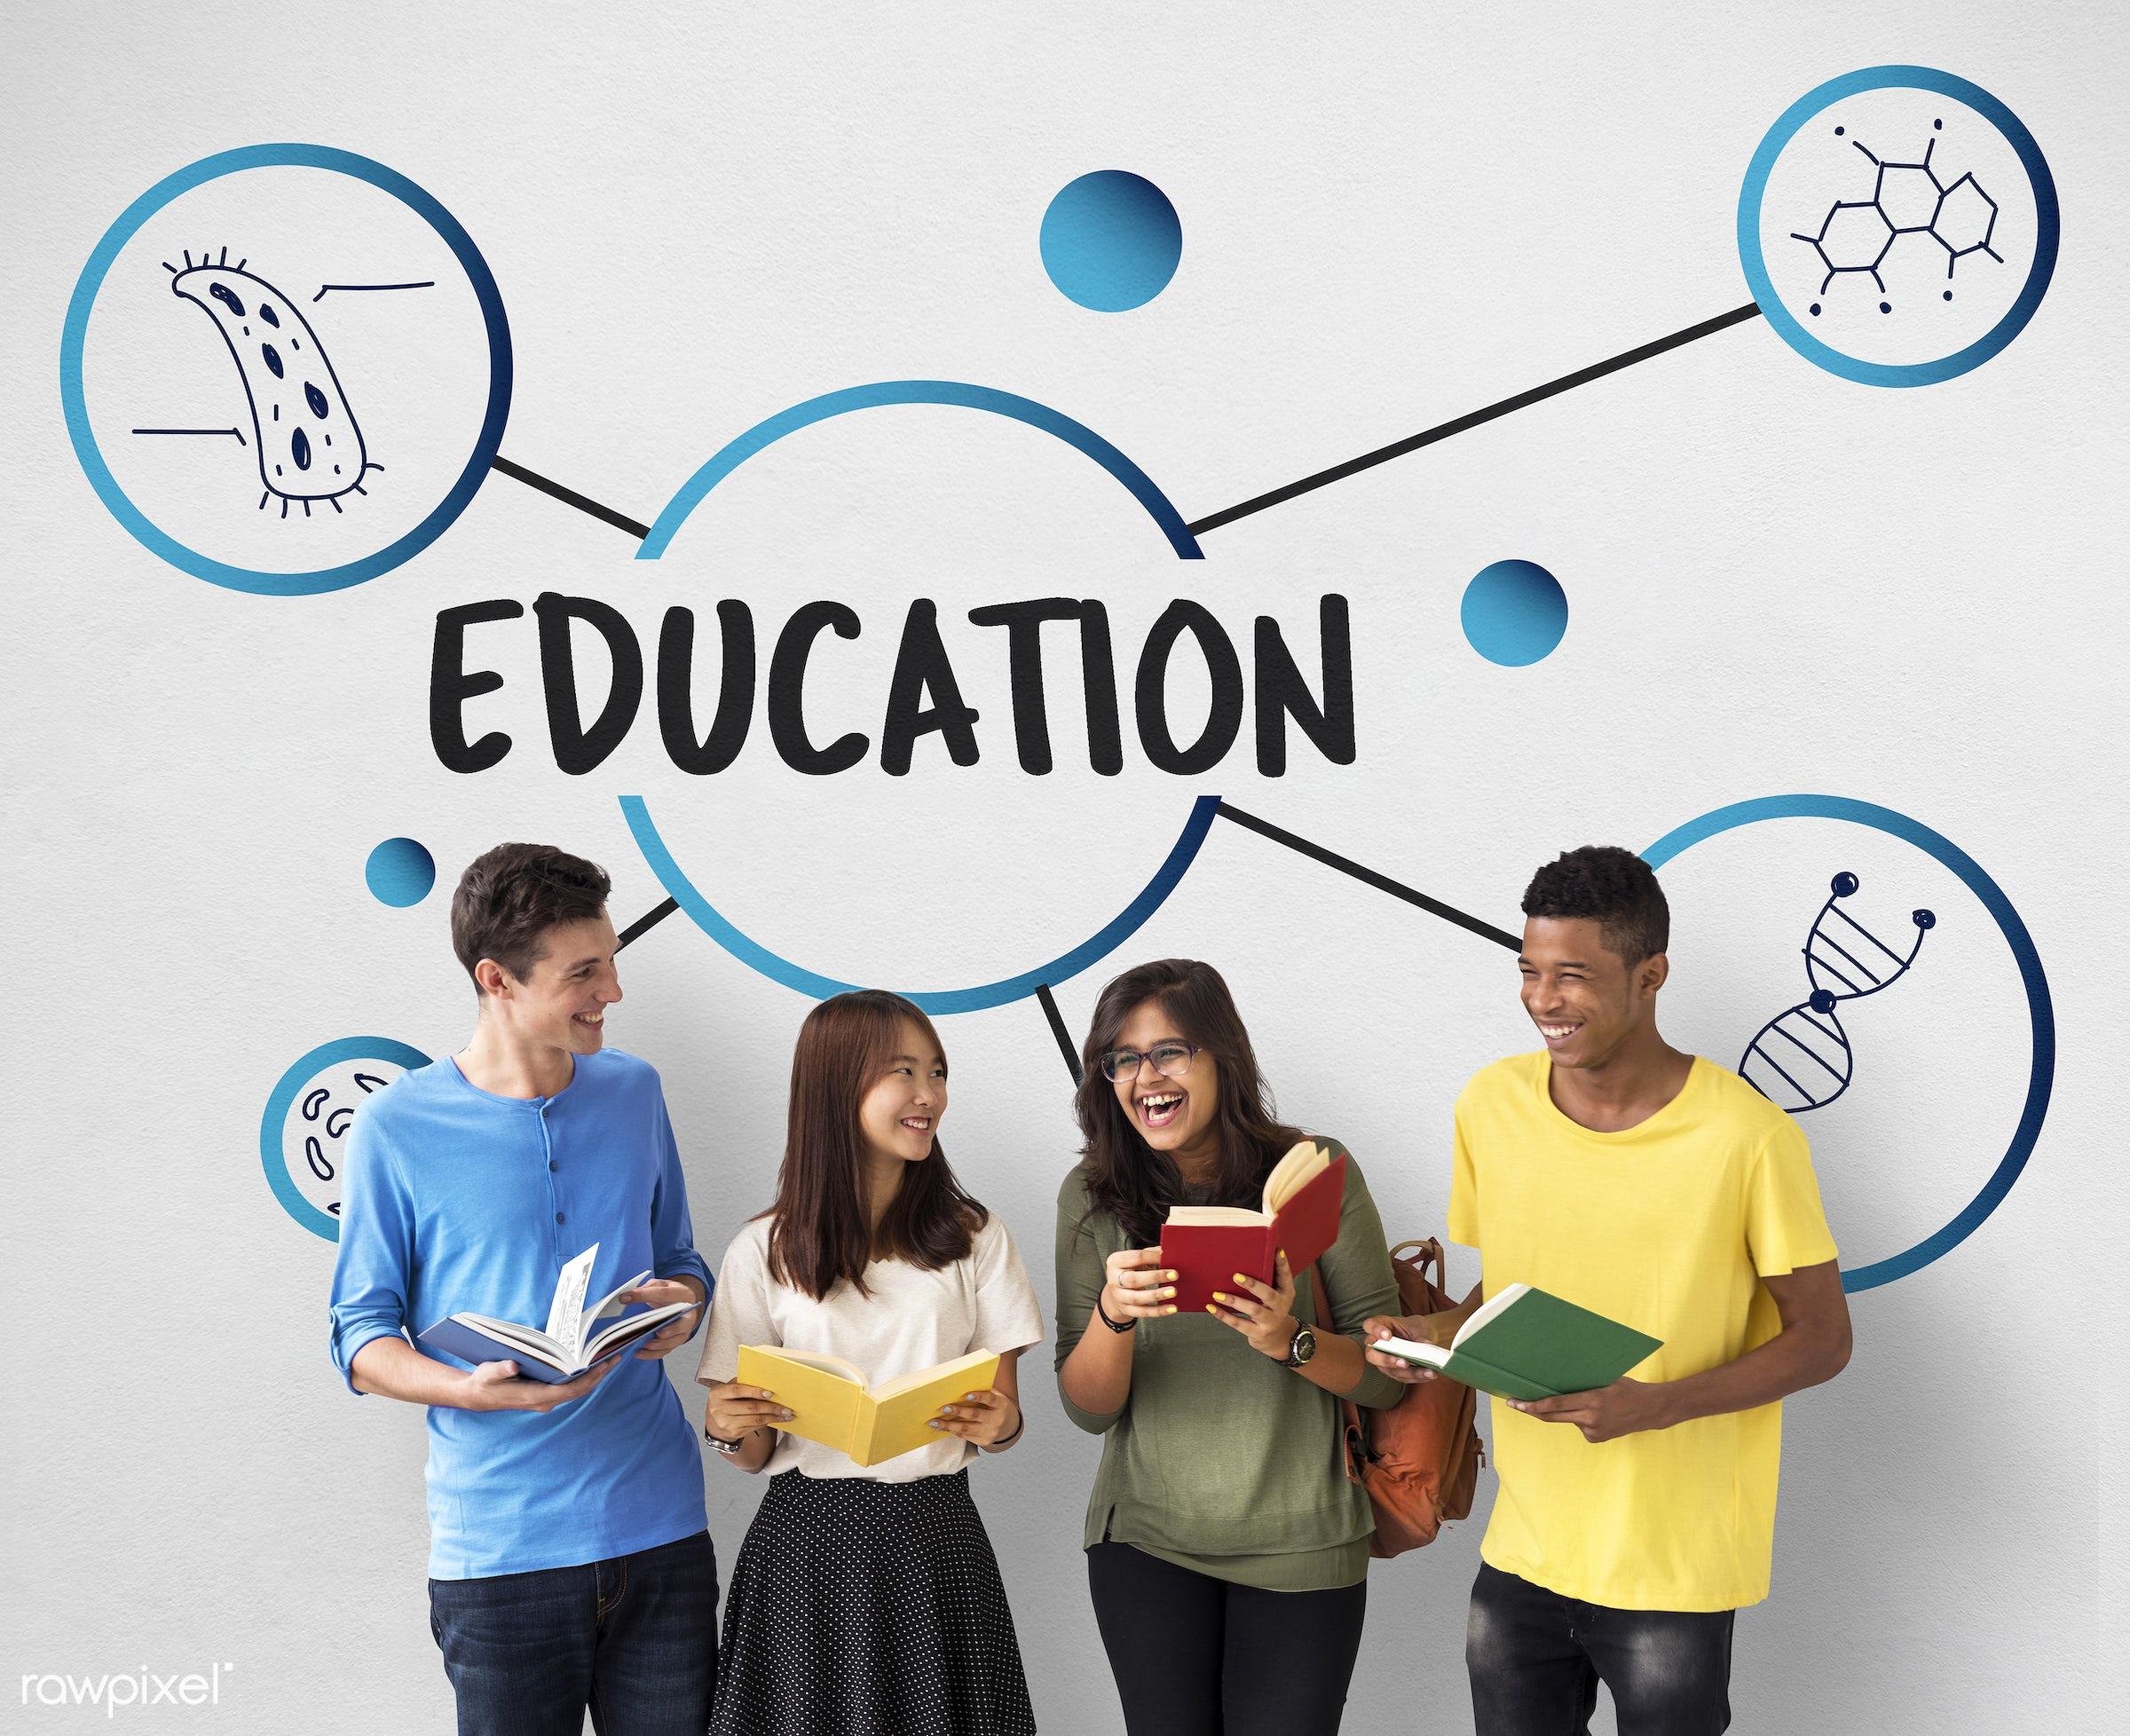 Education - african descent, asian, biochemistry, biotech, book, caucasian, complexity, connection, development, diversity,...